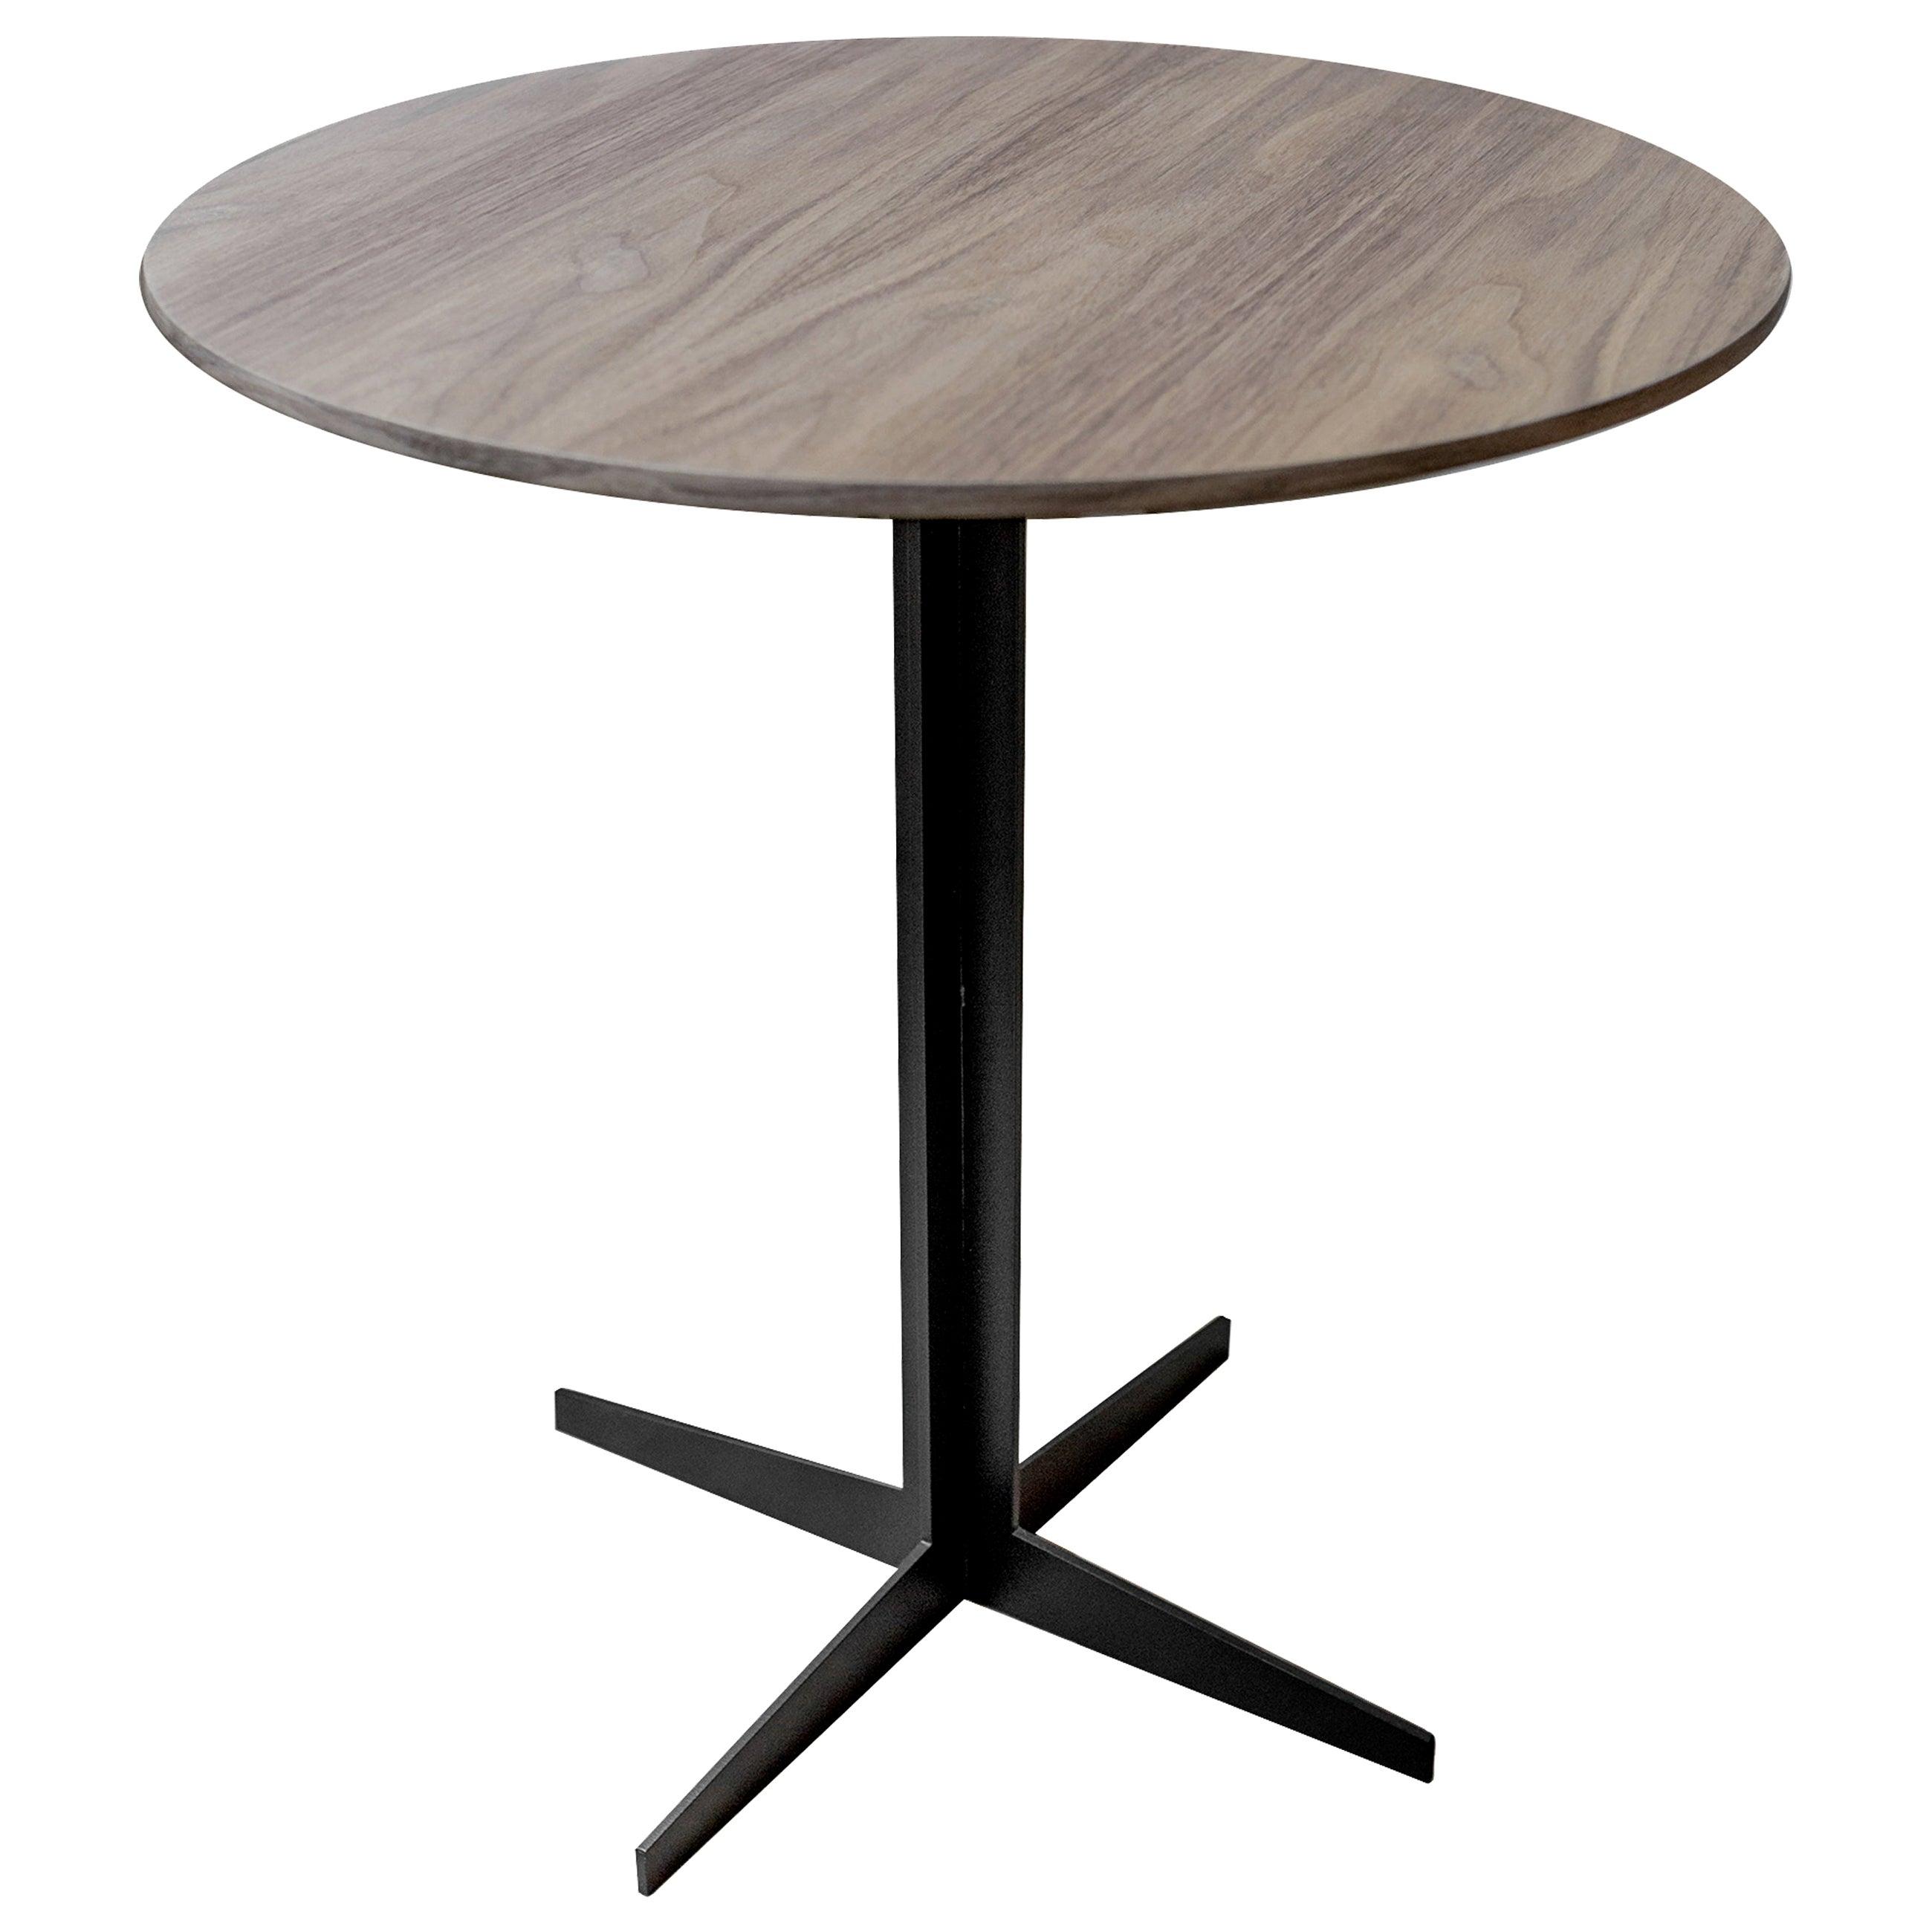 Ensamble Steel and Walnut Veneer Side Table